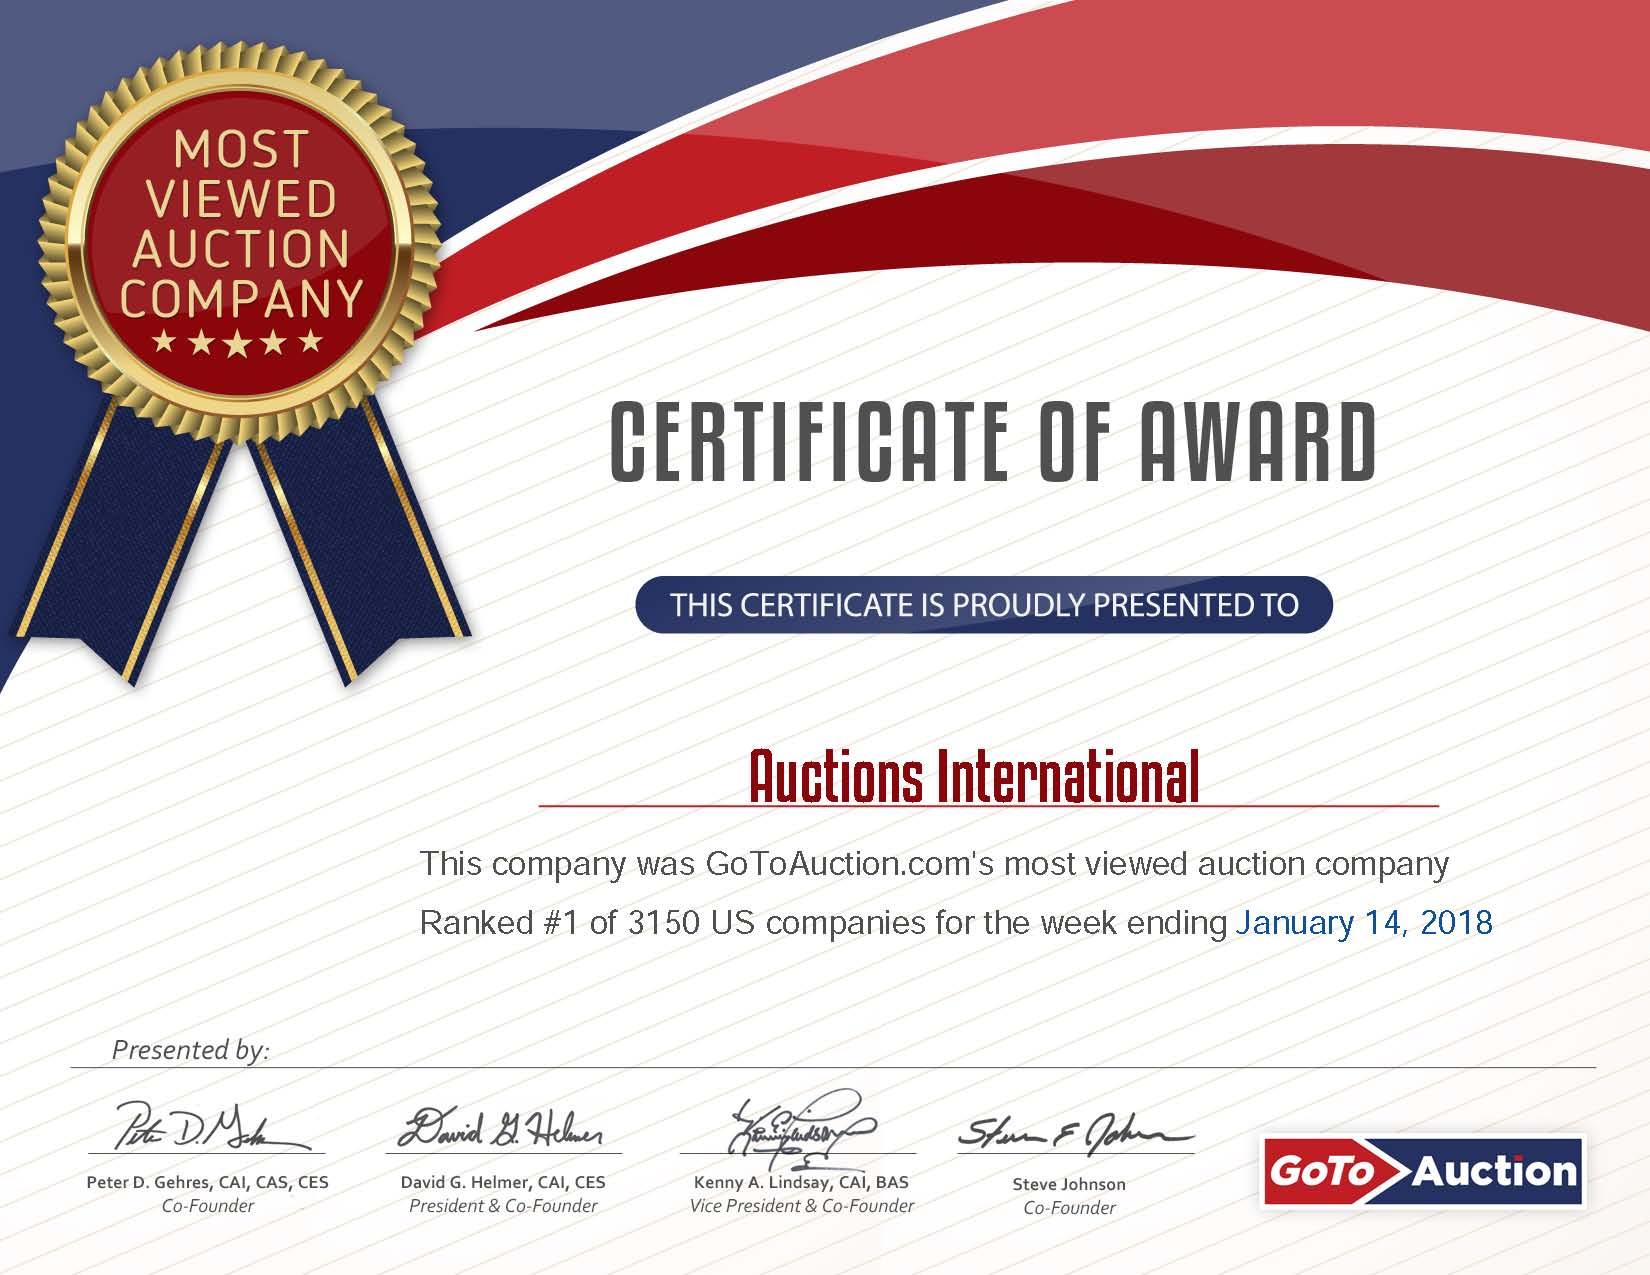 GoToAuction 1.14.2018 USA